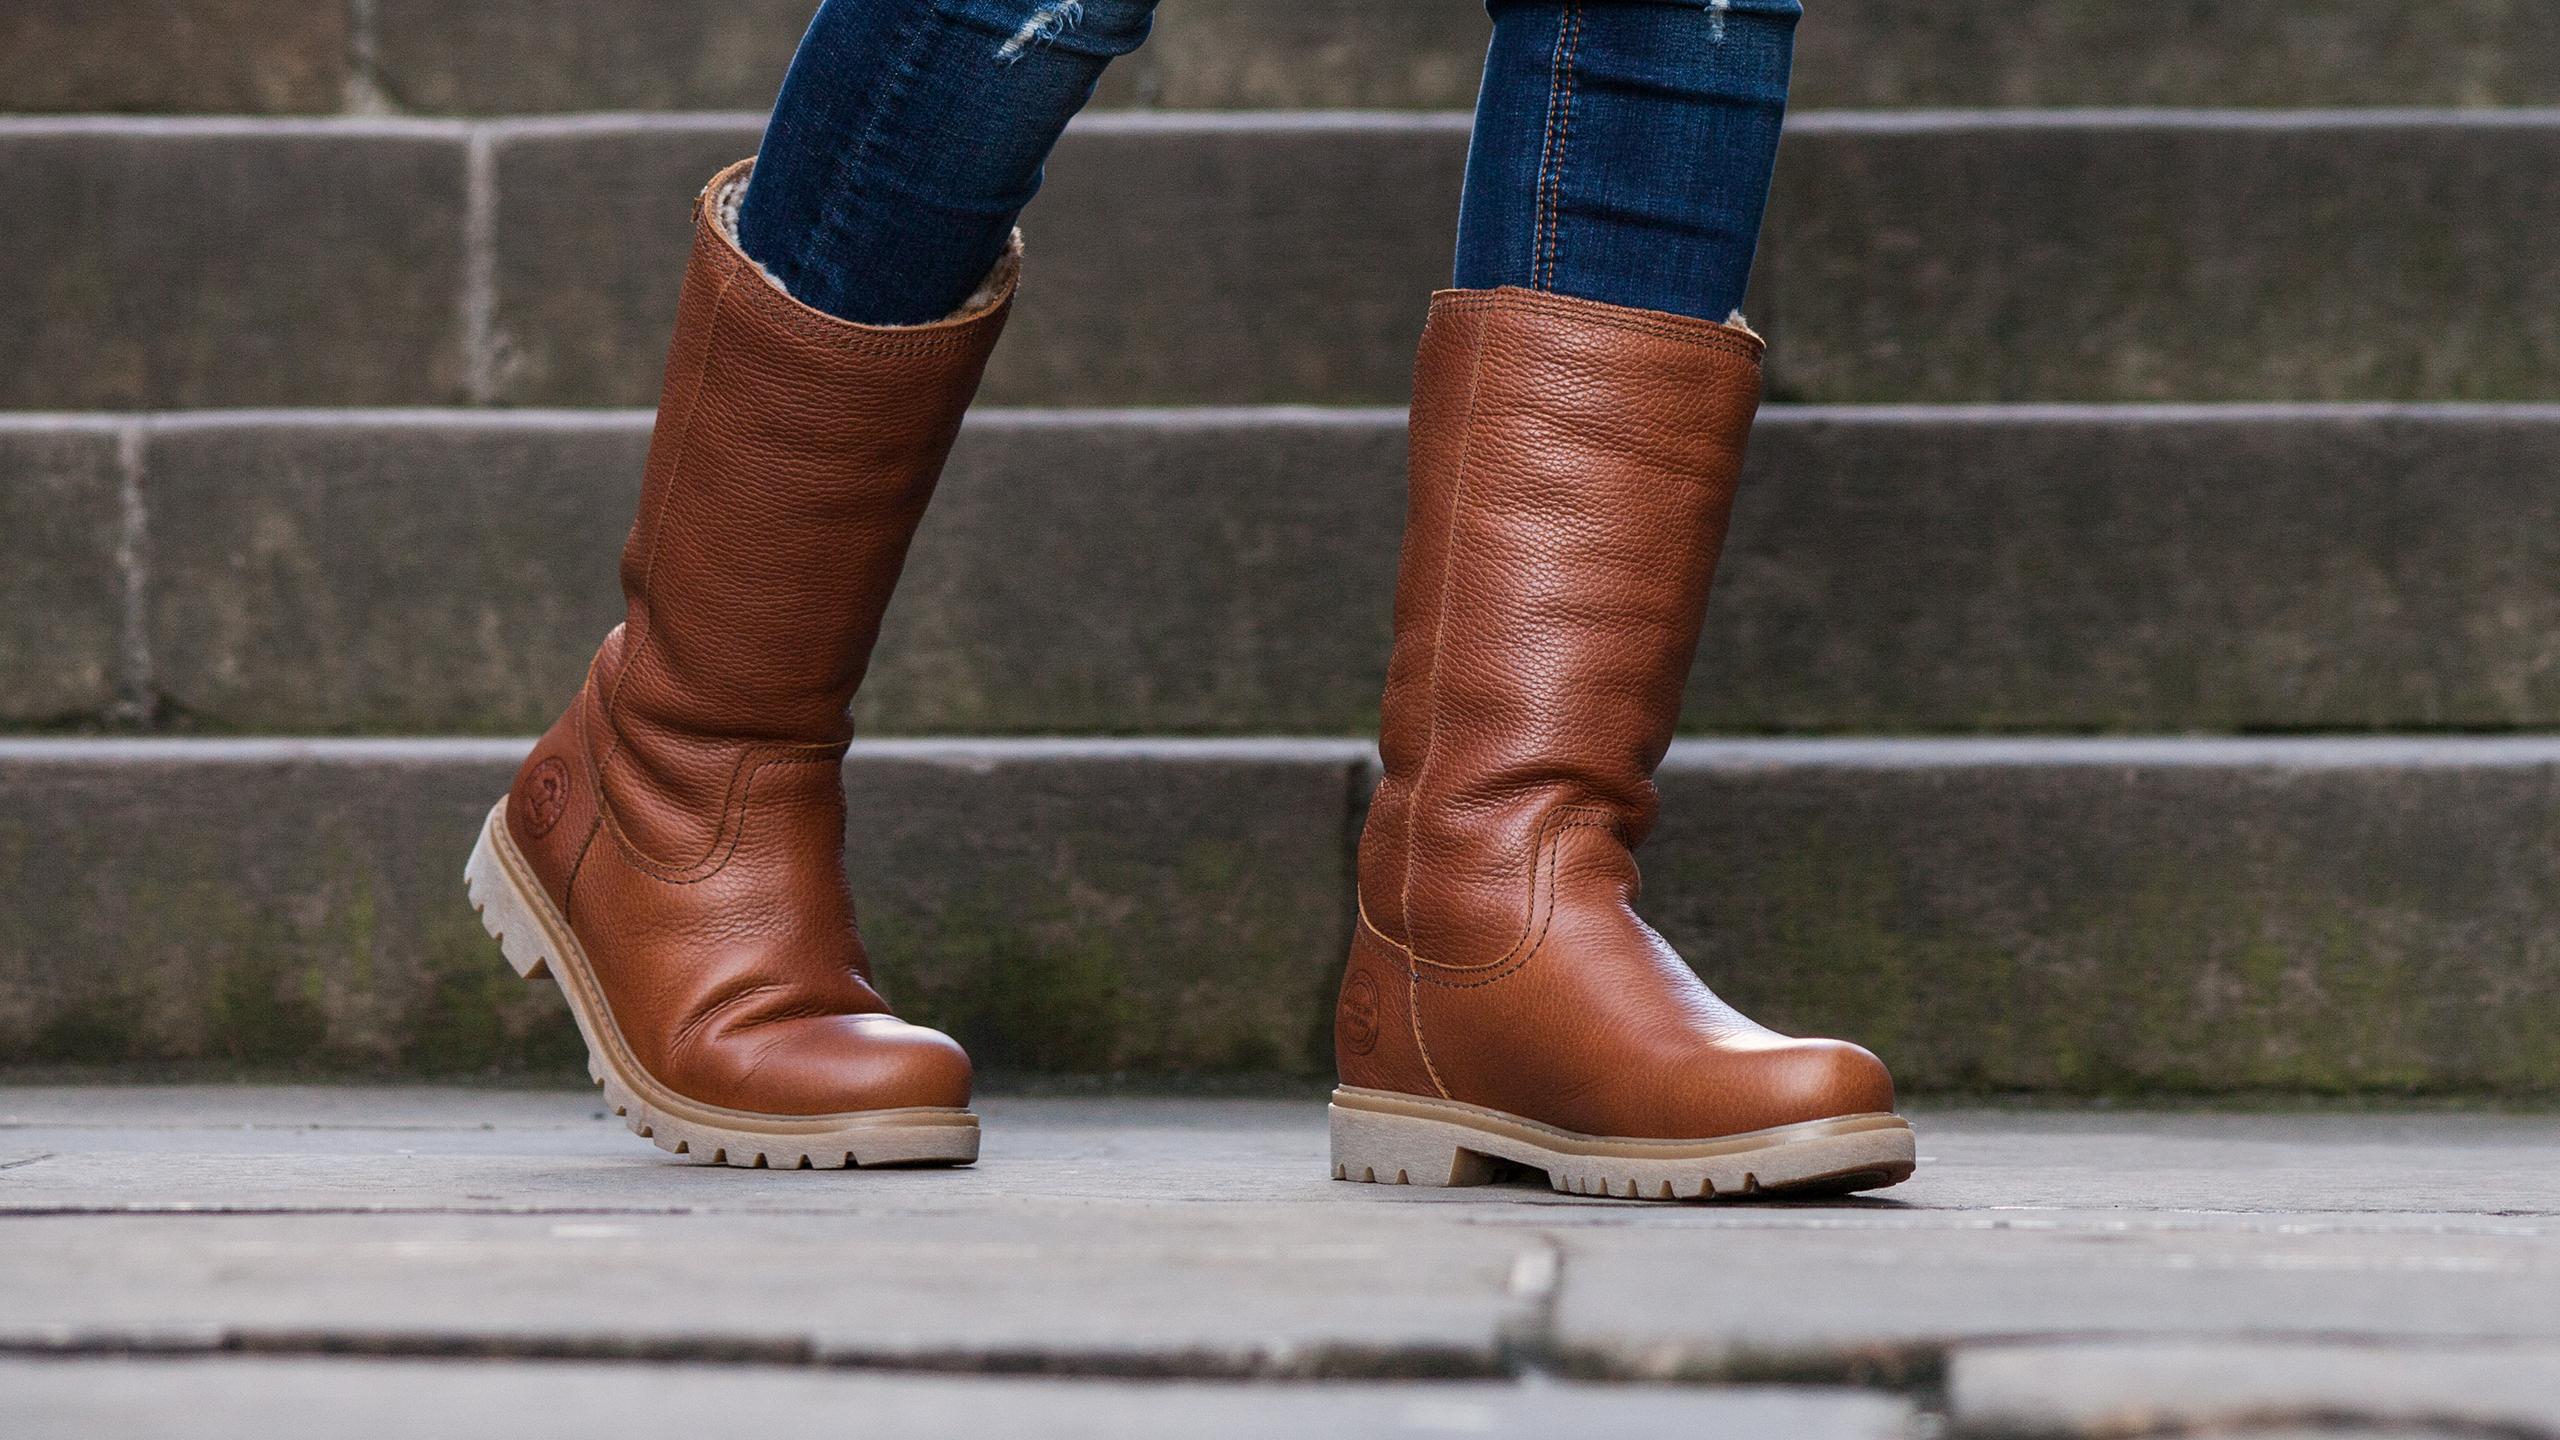 349db8fcaaf632 Womens boots BAMBINA bark